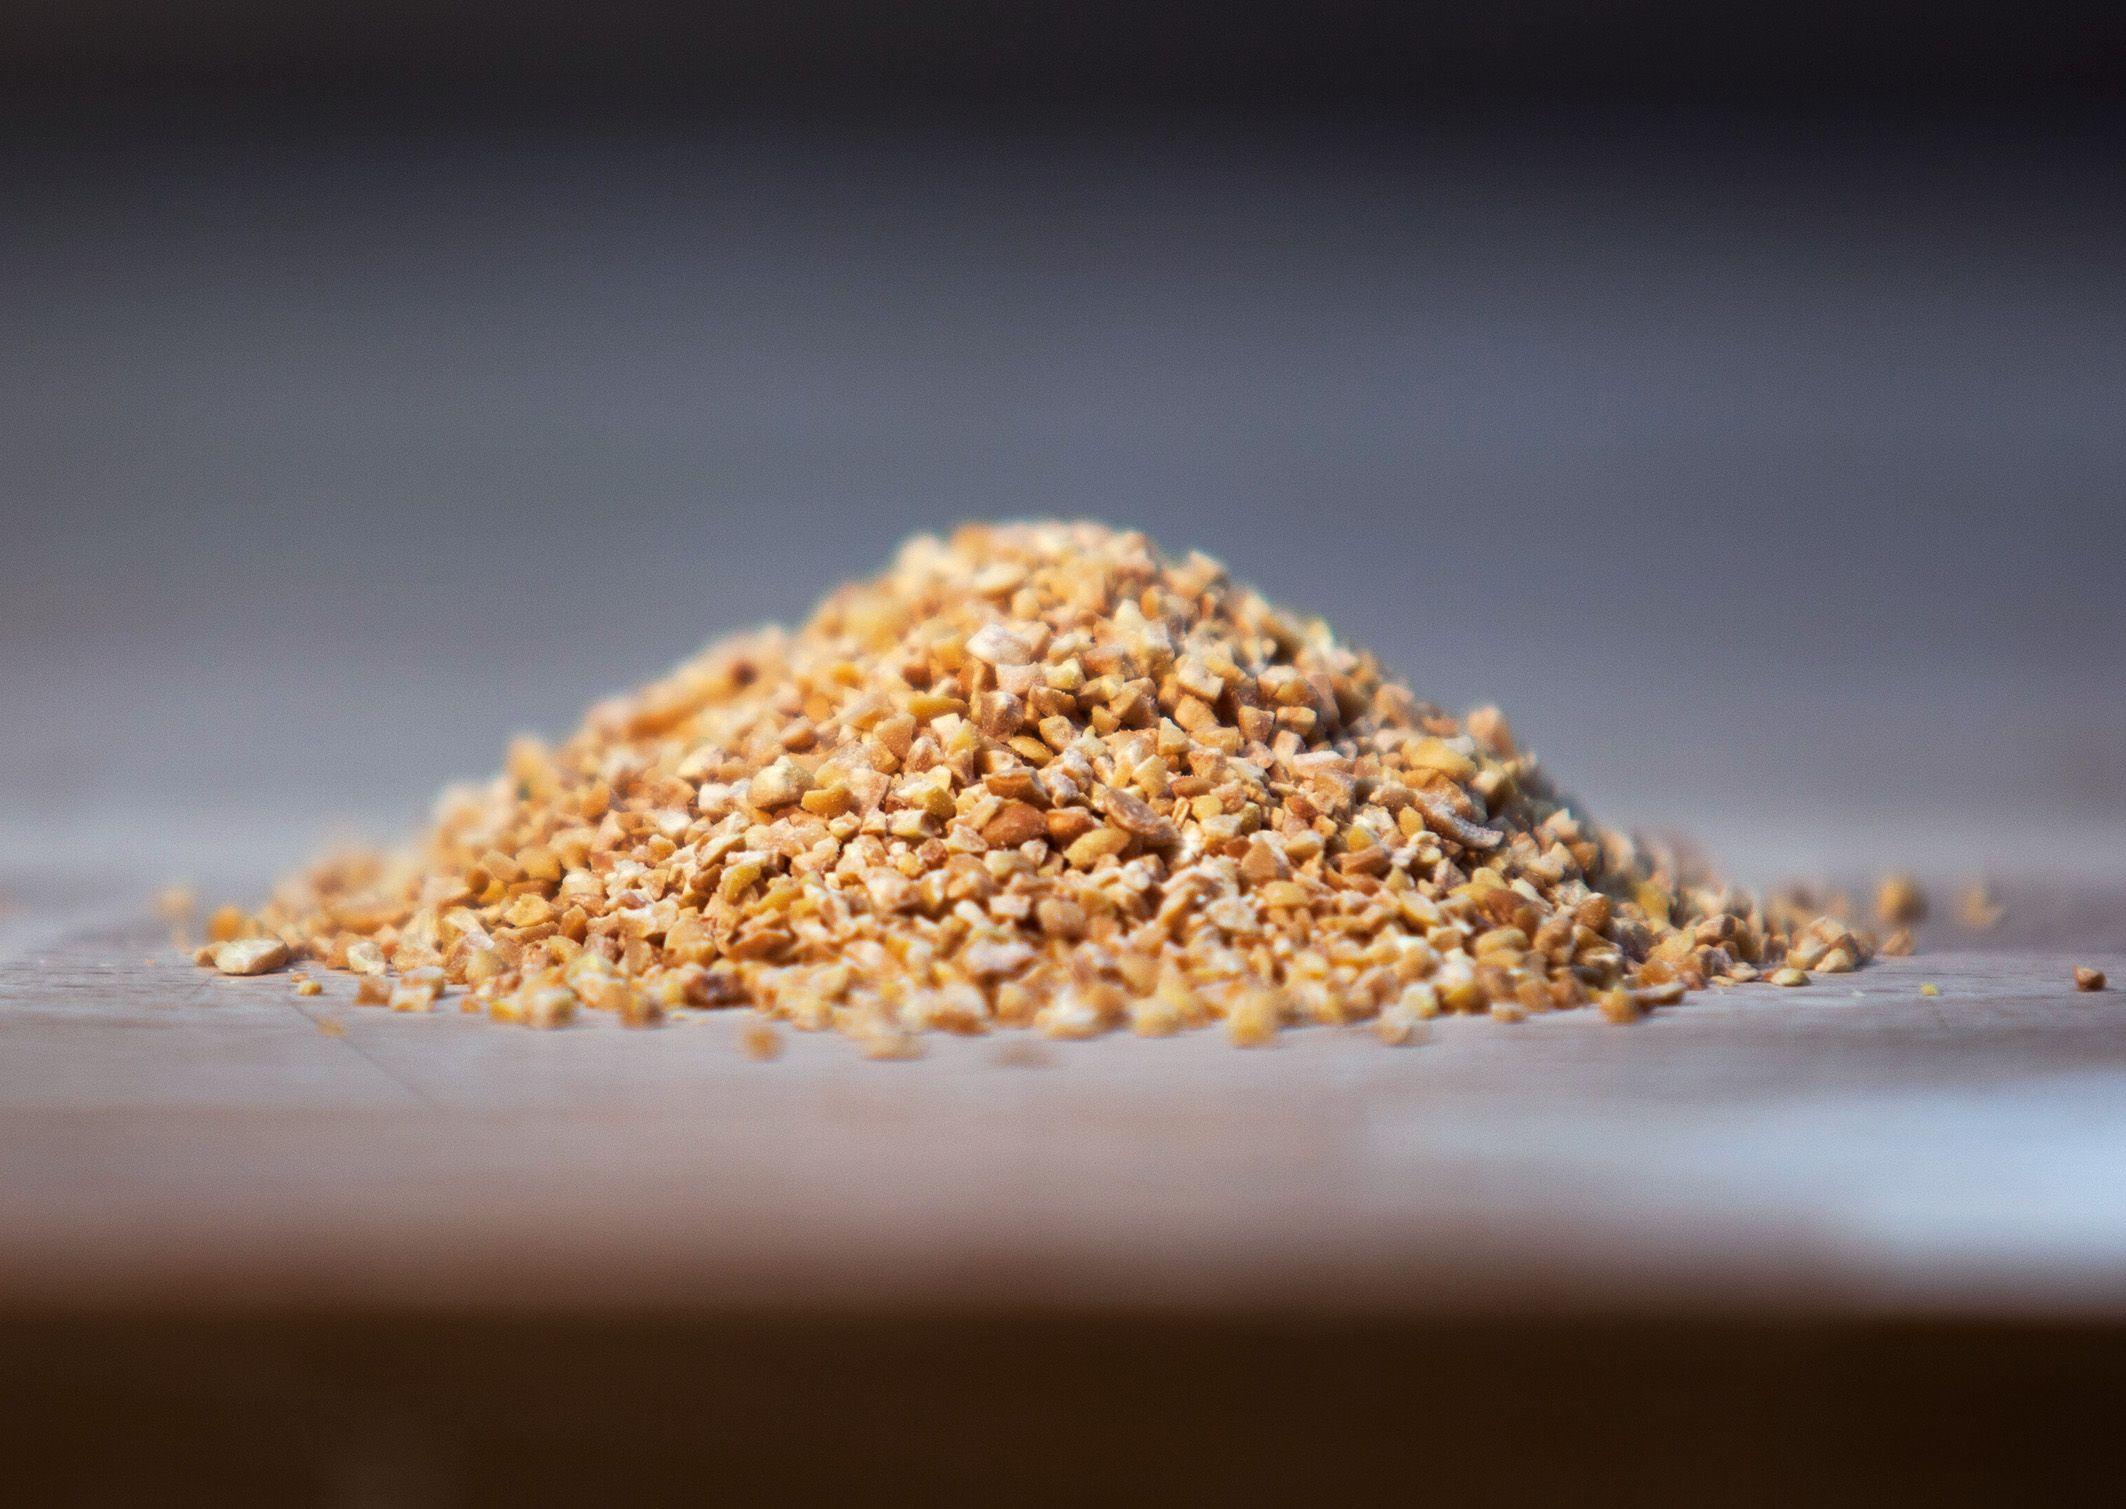 GMI_YePea pea meal raw materials_300dpi